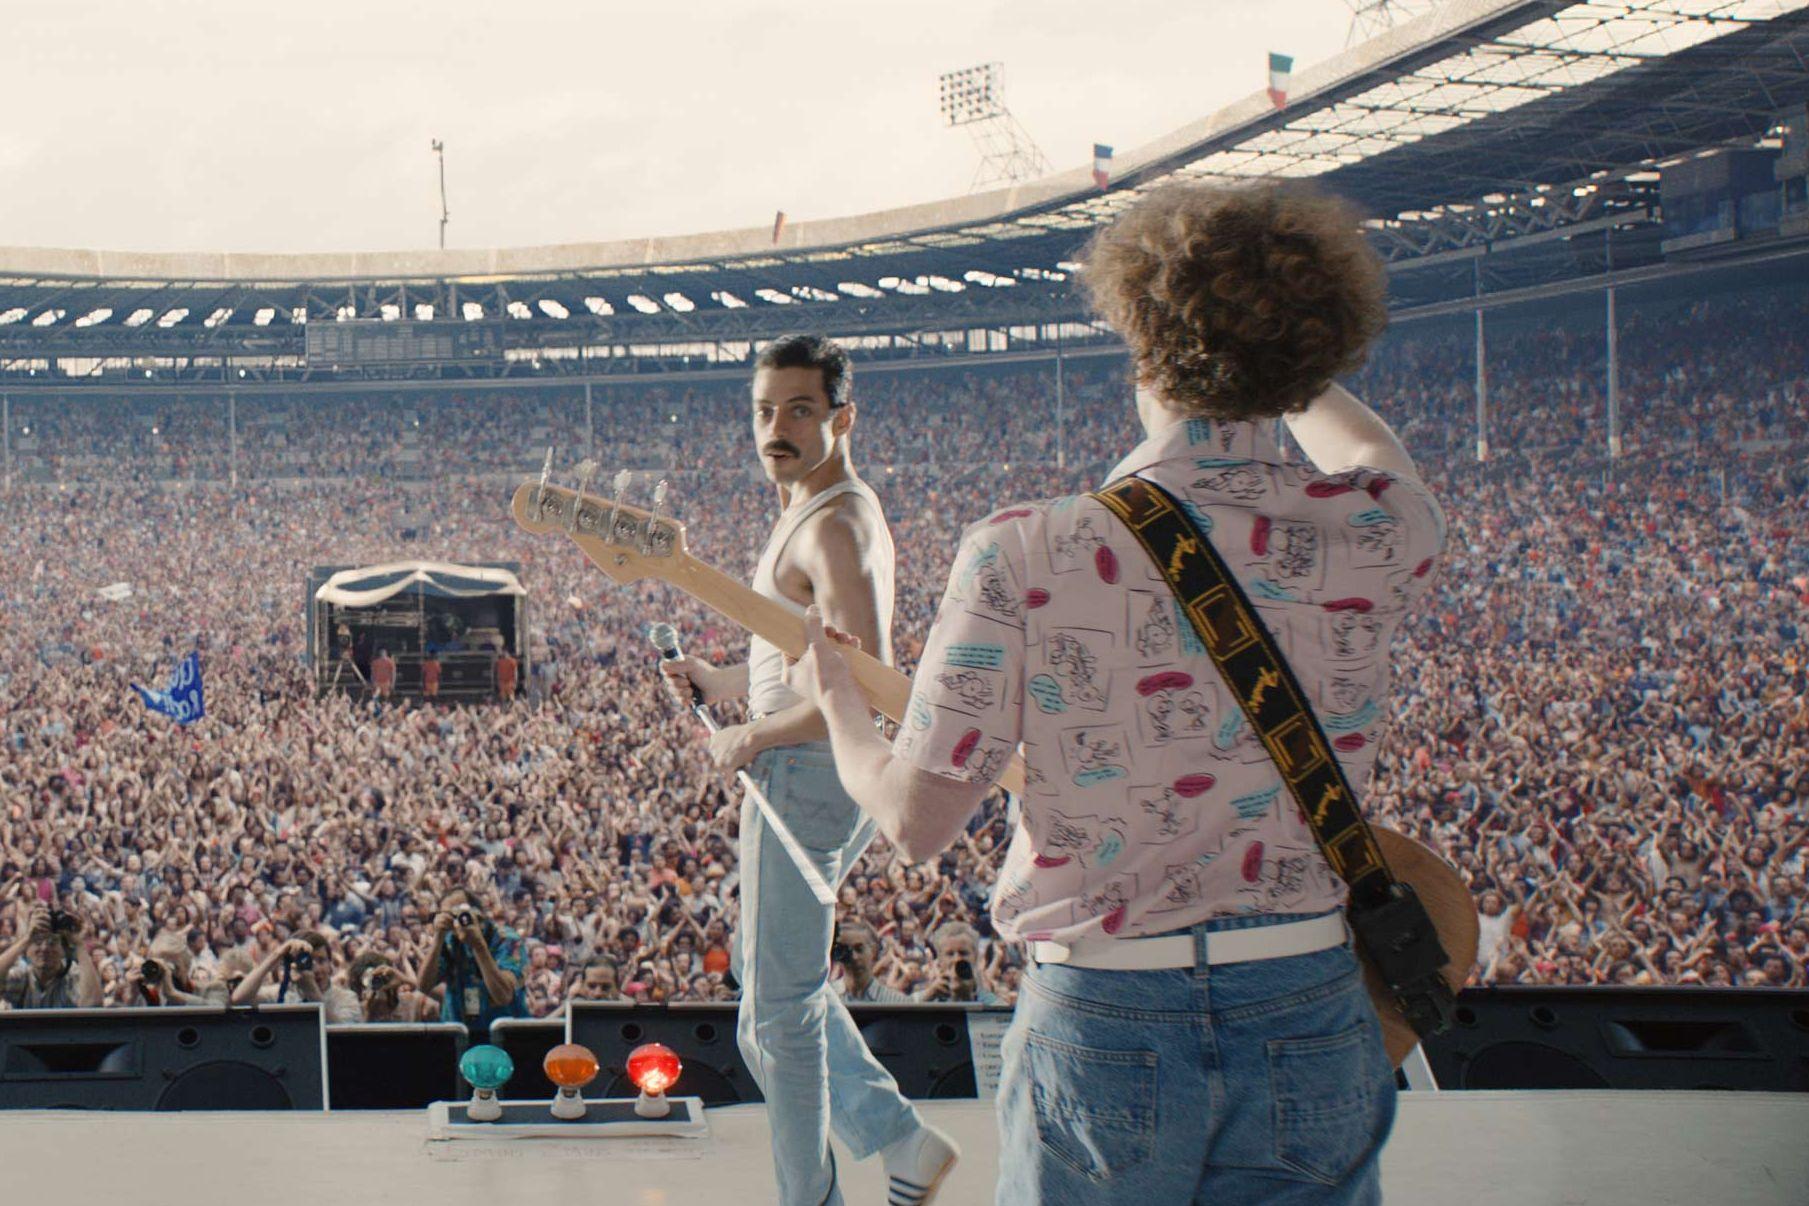 Gwilym Lee, Ben Hardy, Rami Malek, Joe Mazzello, Brian May, Roger Taylor, Freddie Mercury, John Deacon, Bohemian Rhapsody